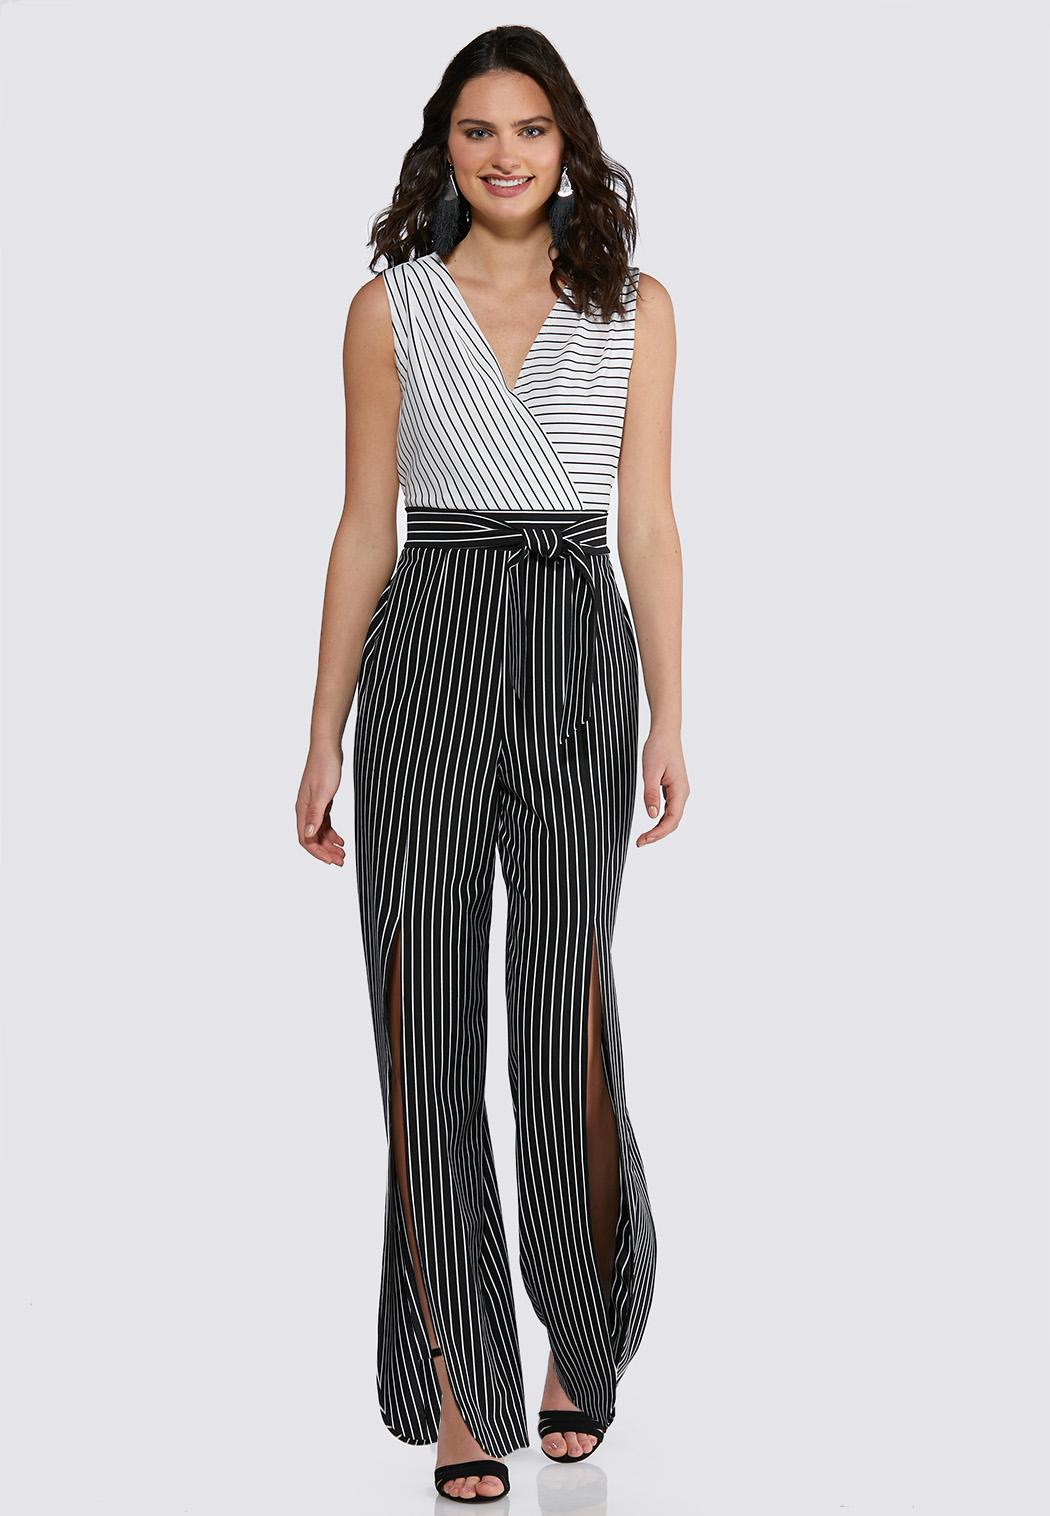 4c6f0a23081 Black And White Slit Pant Jumpsuit Jumpsuits Cato Fashions